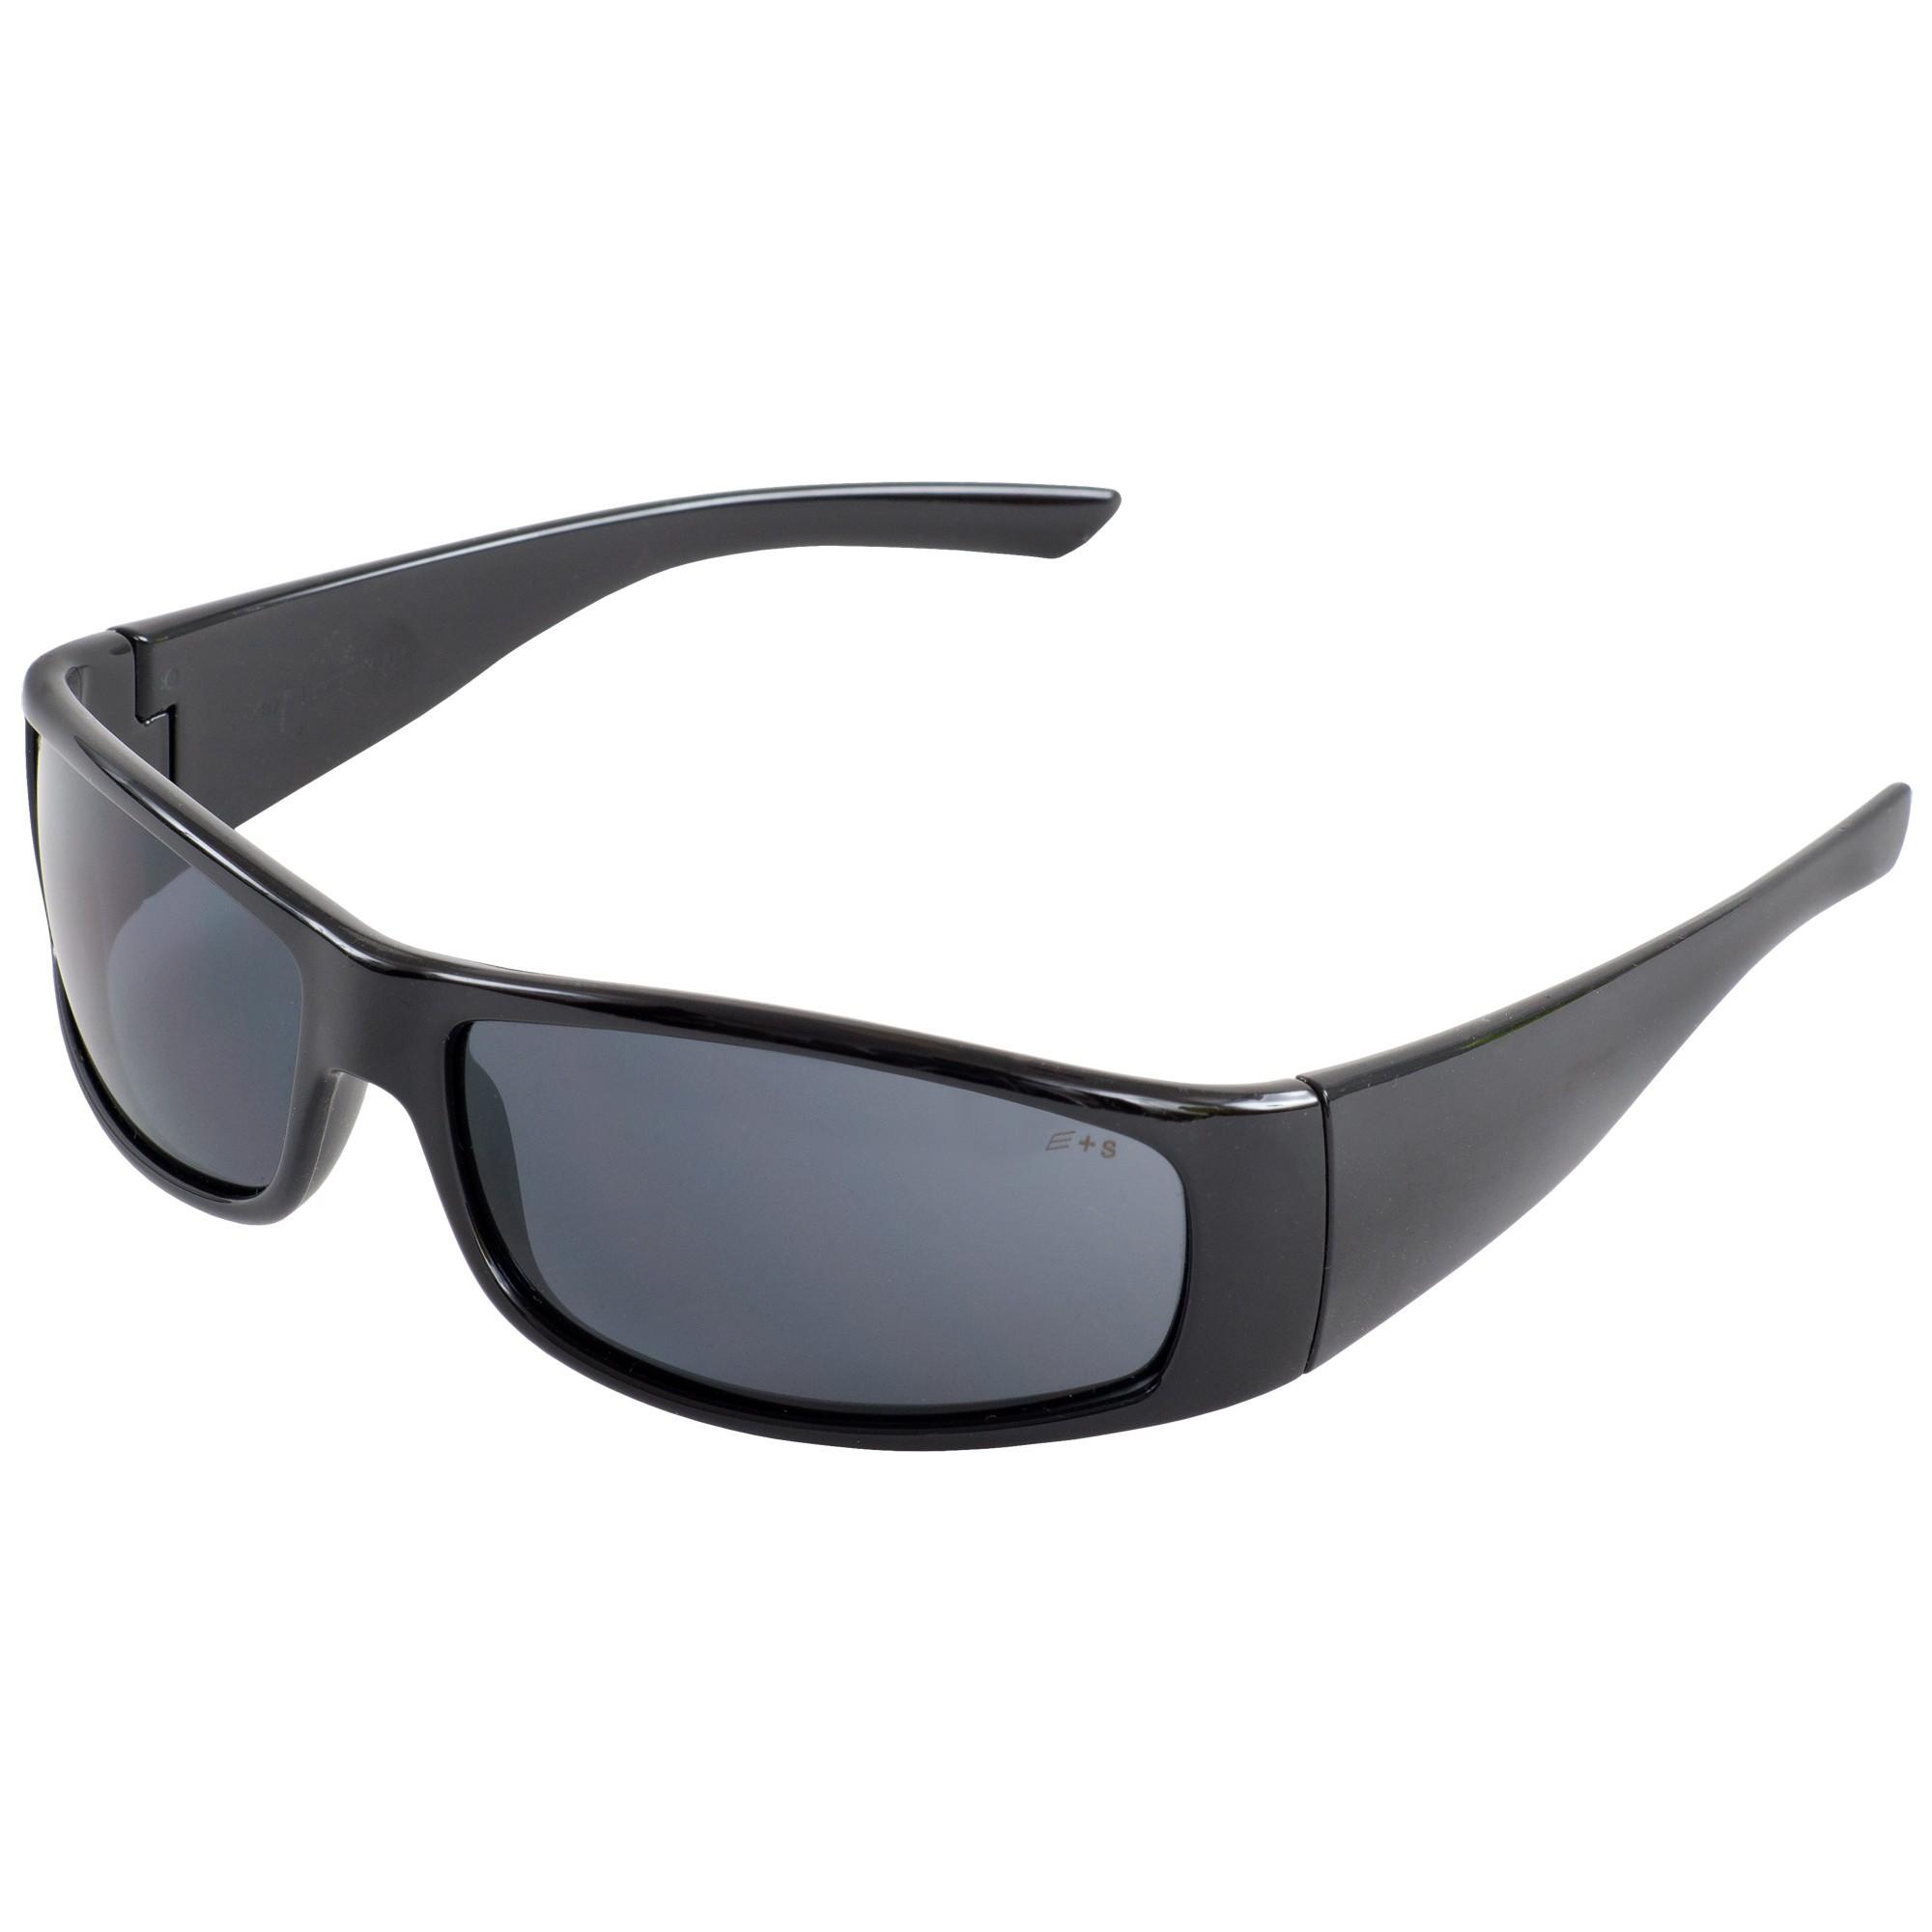 Xtreme Glasses Frames : ERB 18026 Boas Xtreme Safety Glasses - Black Frame - Gray ...